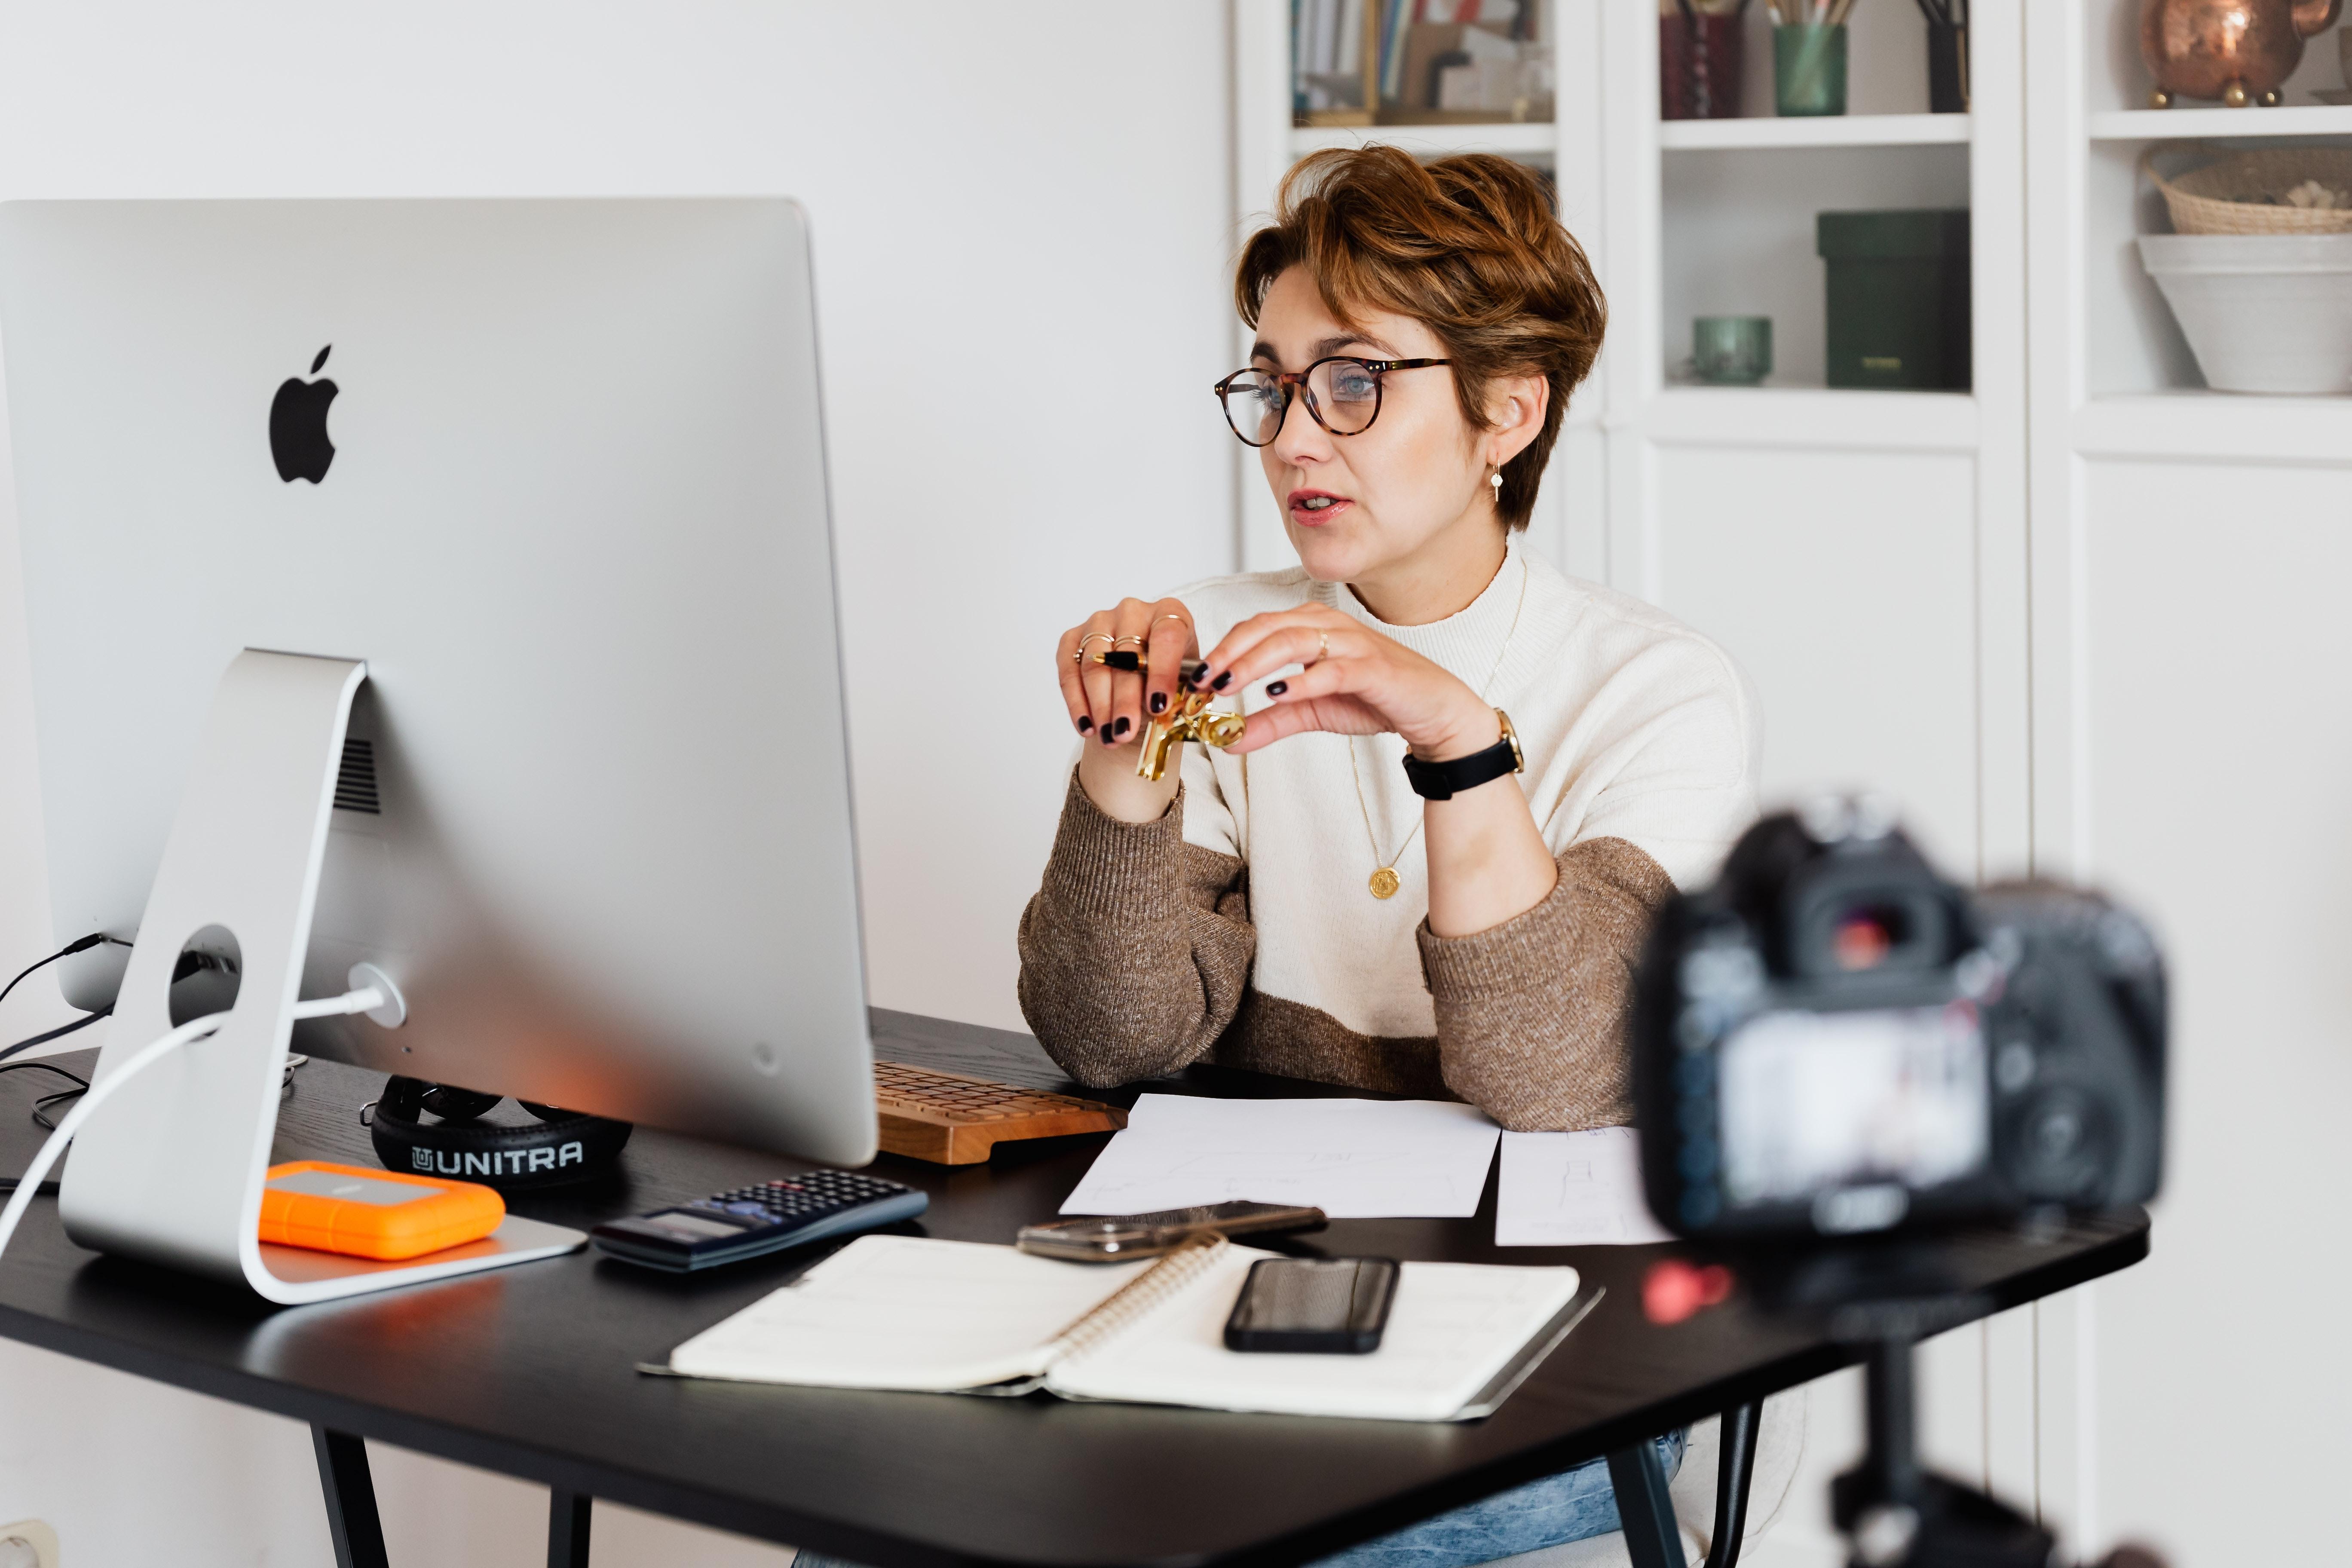 Tips for Managing Virtual Team Meetings